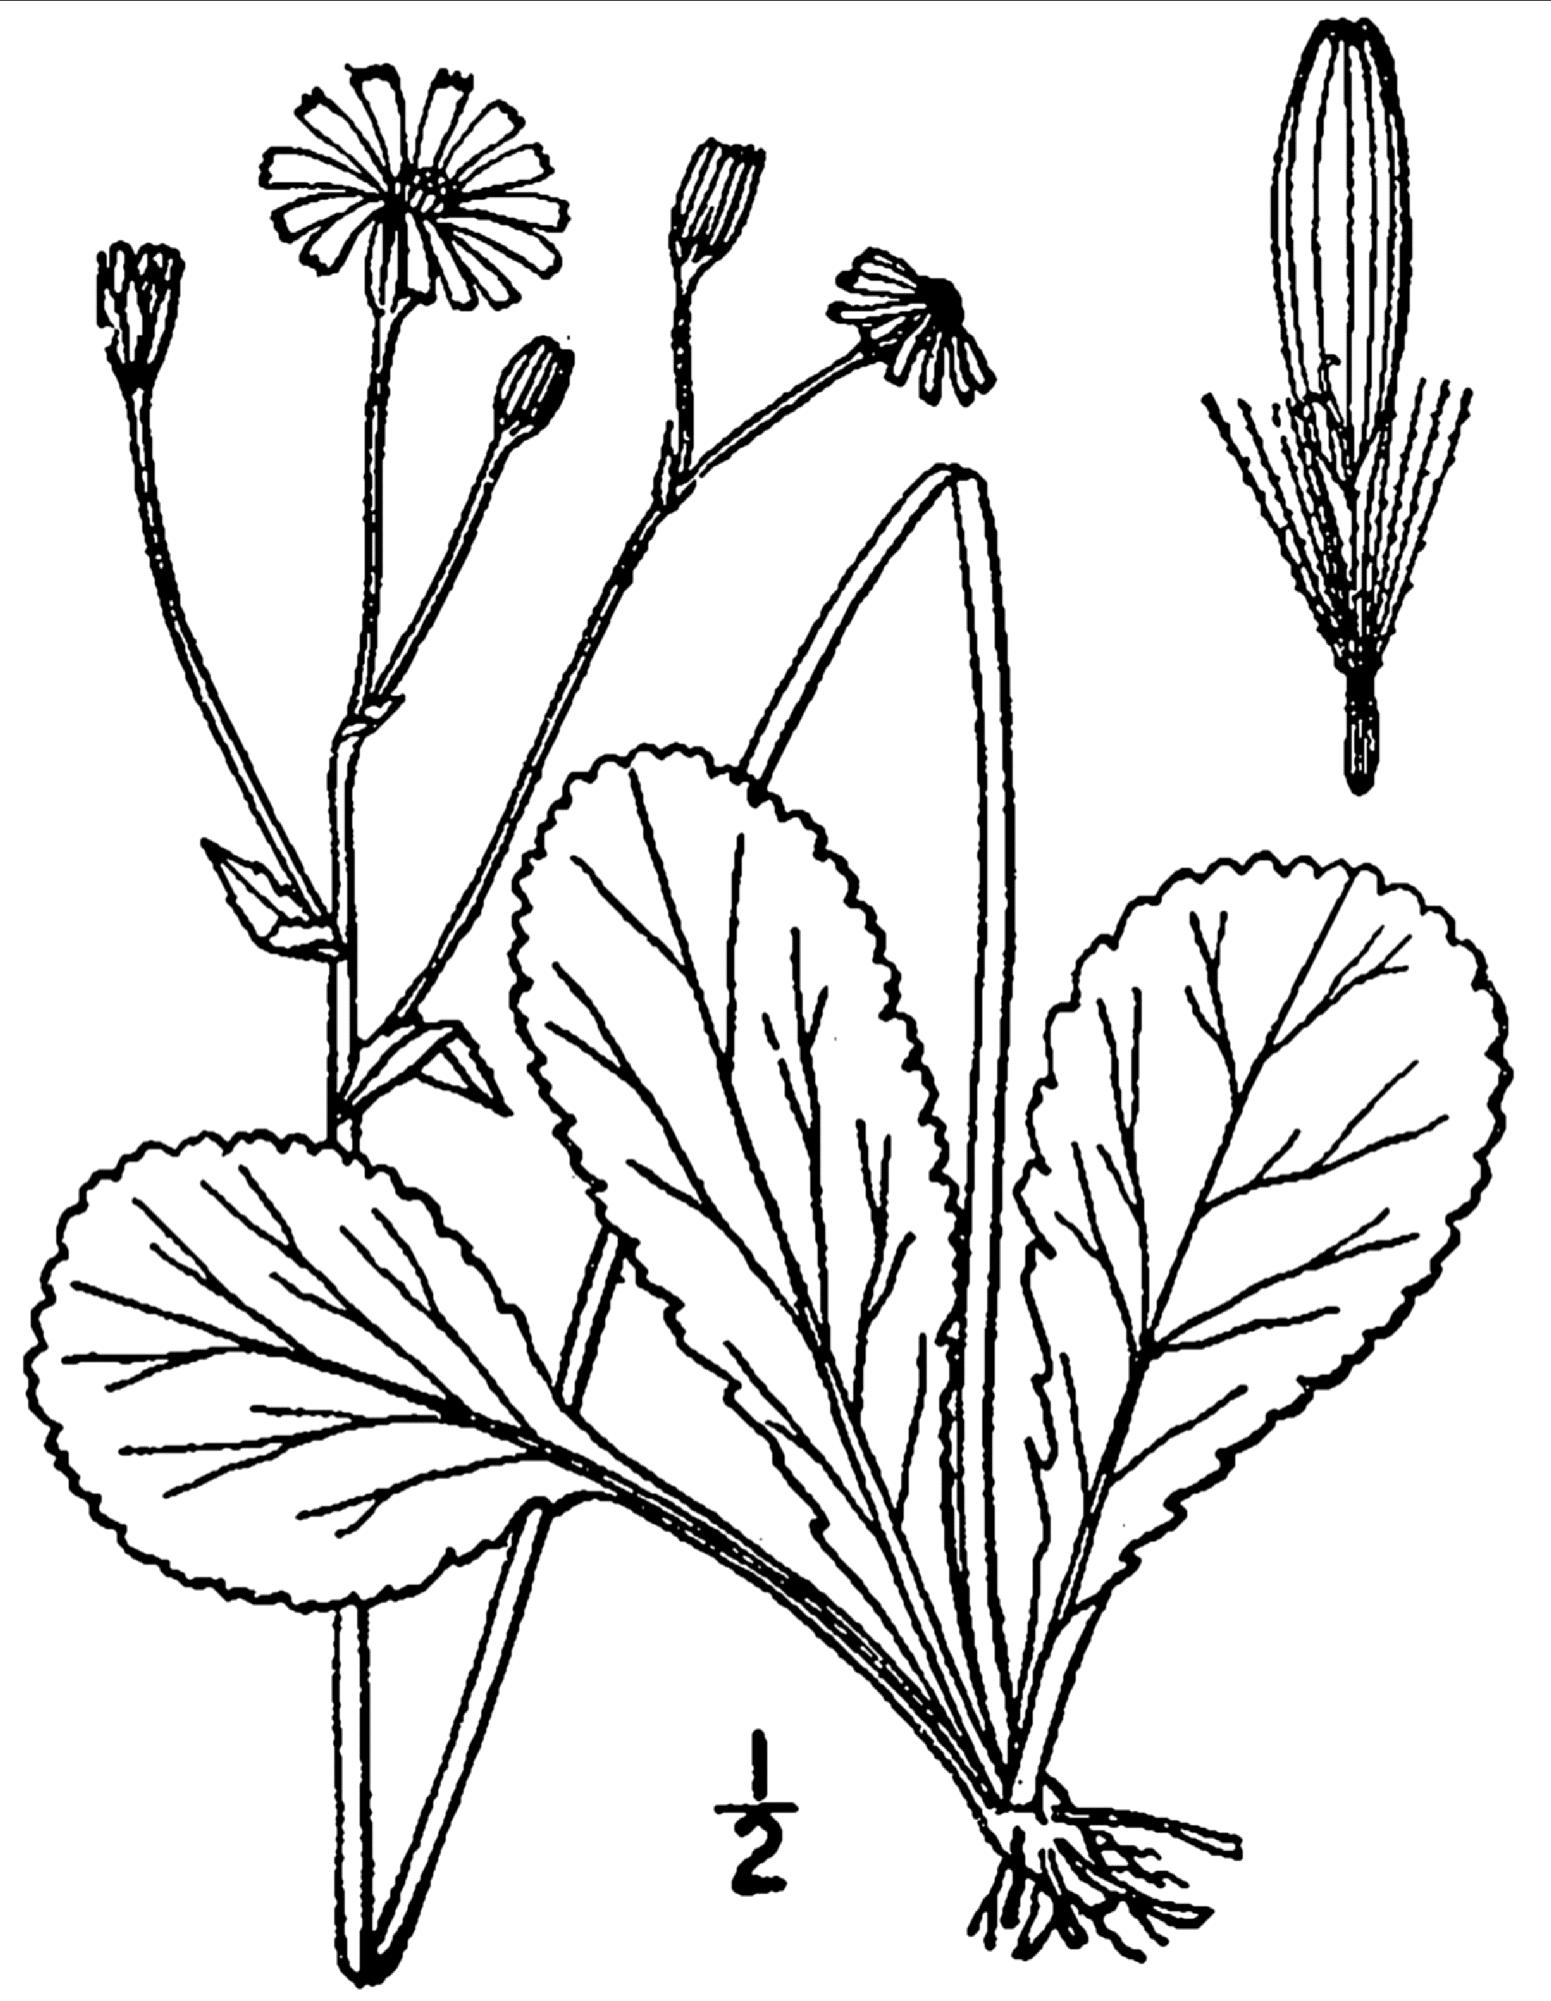 Packera obovata (Muhl. ex Willd.) W.A. Weber & A. Löve - Checklist ...